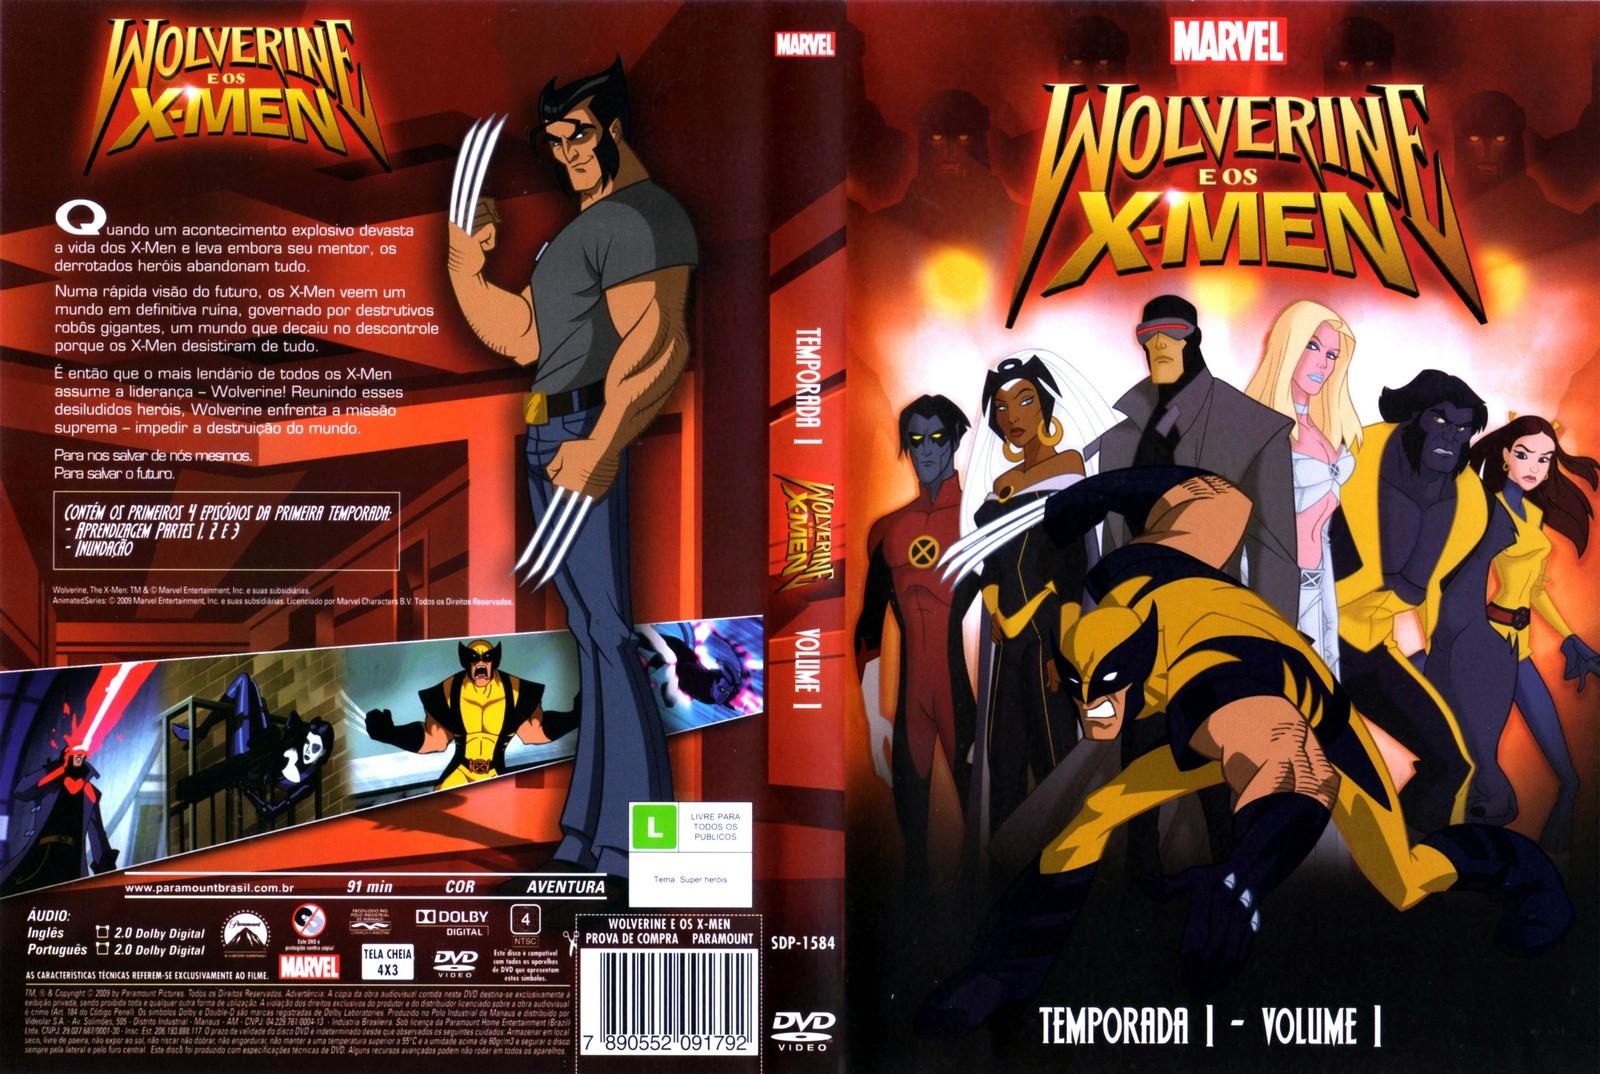 [Wolverine+E+Os+X-Men+-+1ª+Temporada+-+Volume+1.jpg]